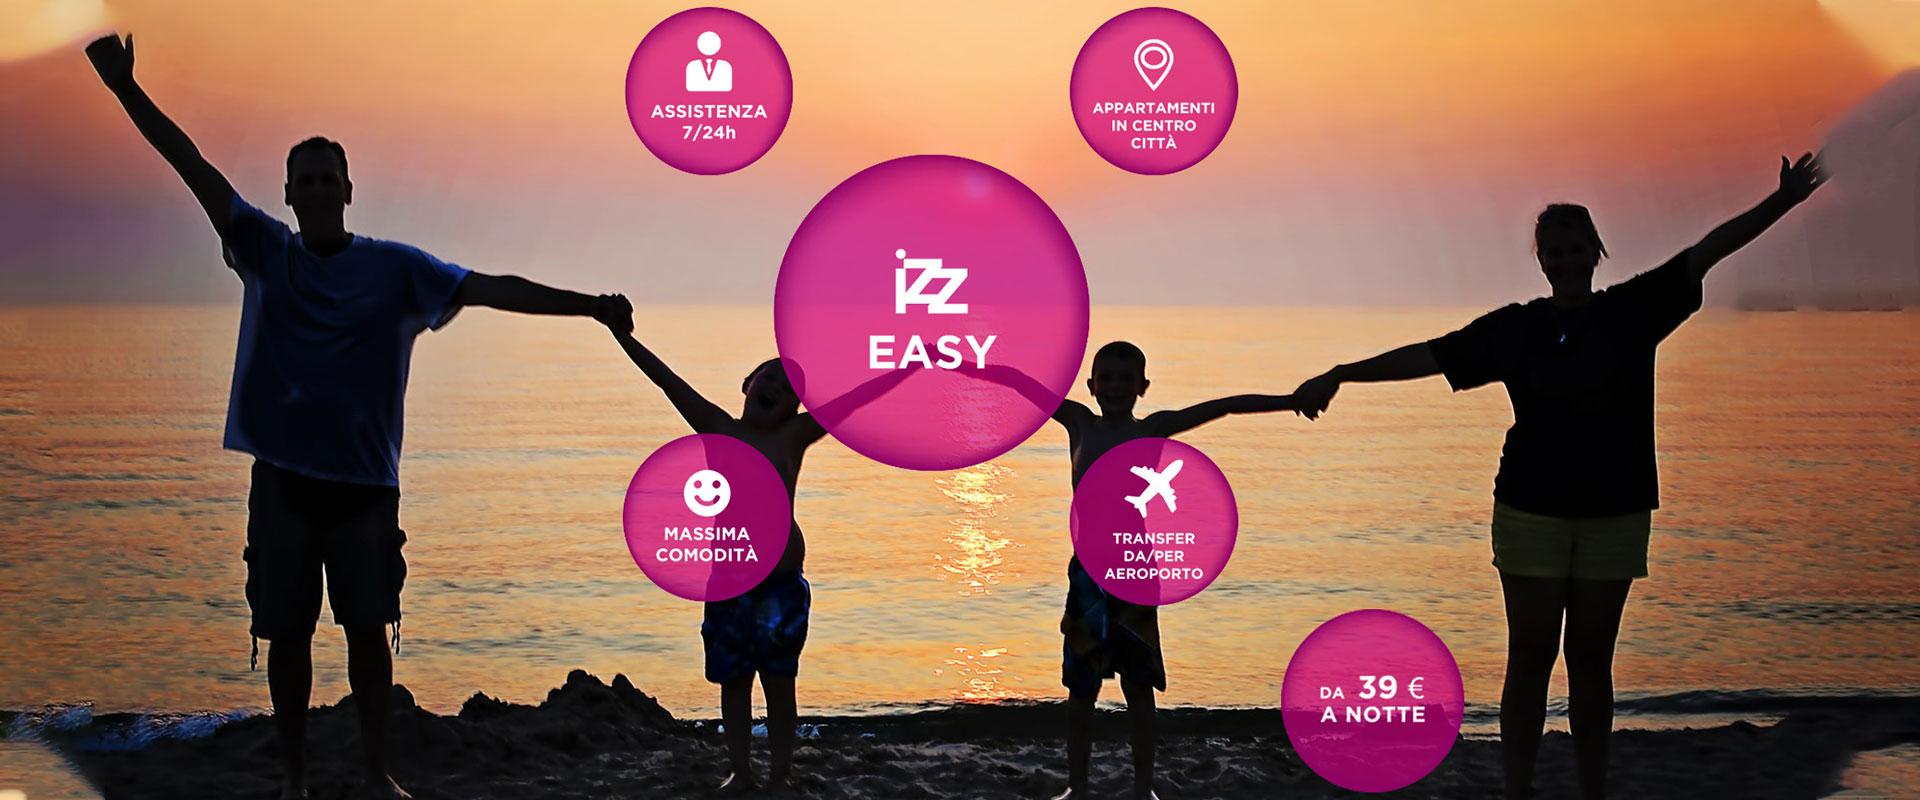 izzhome-izzeasy-header-12